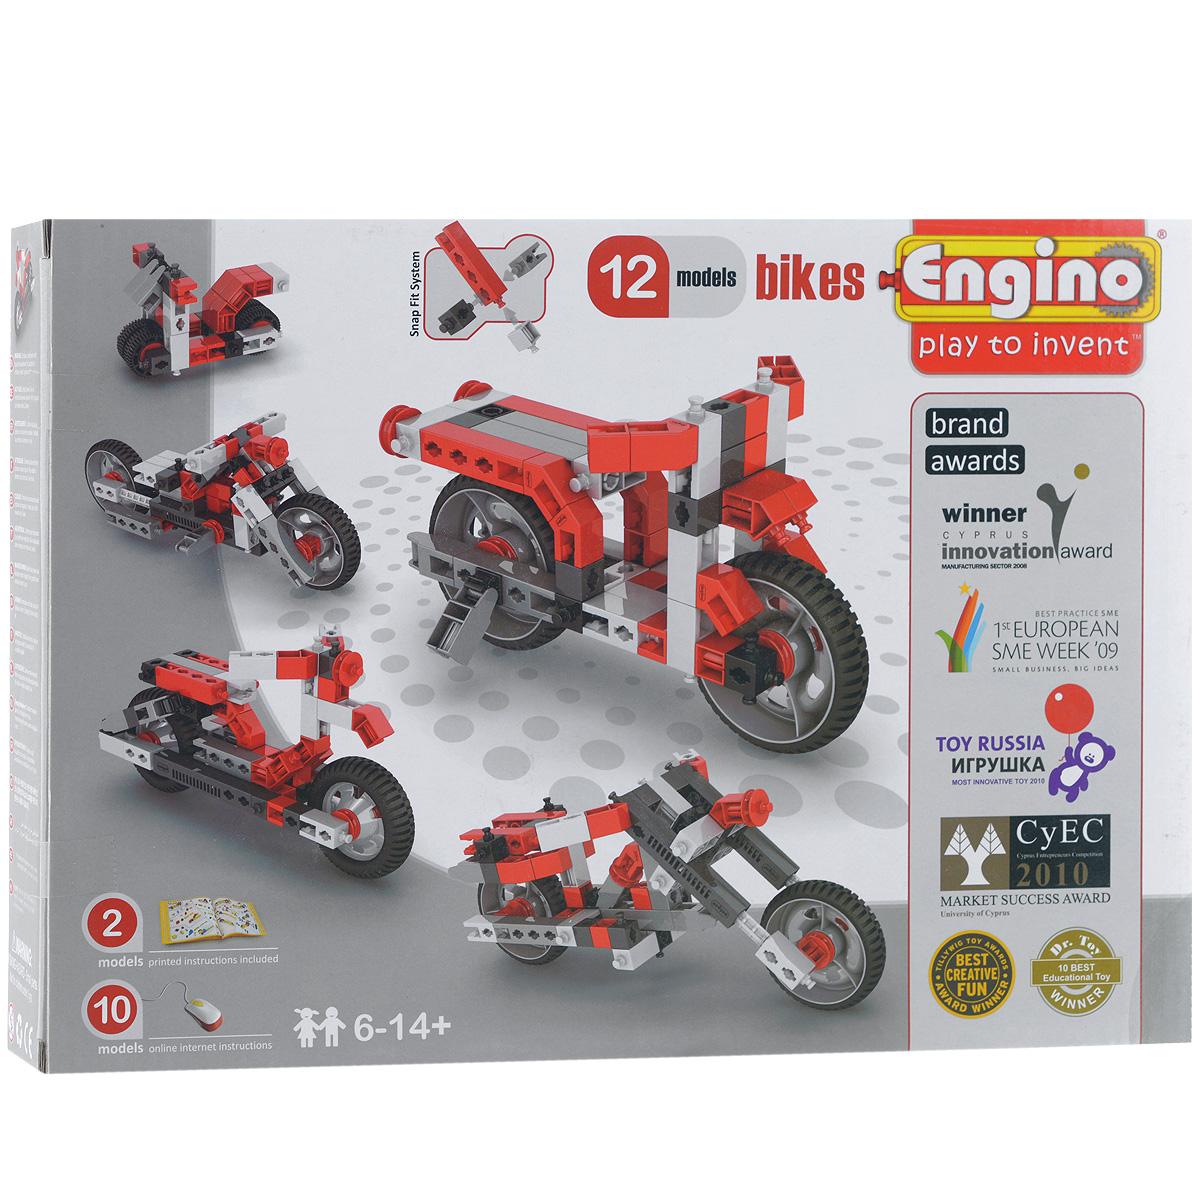 Engino Конструктор Bikes PB32 engino конструктор inventor приключения 170 элементов